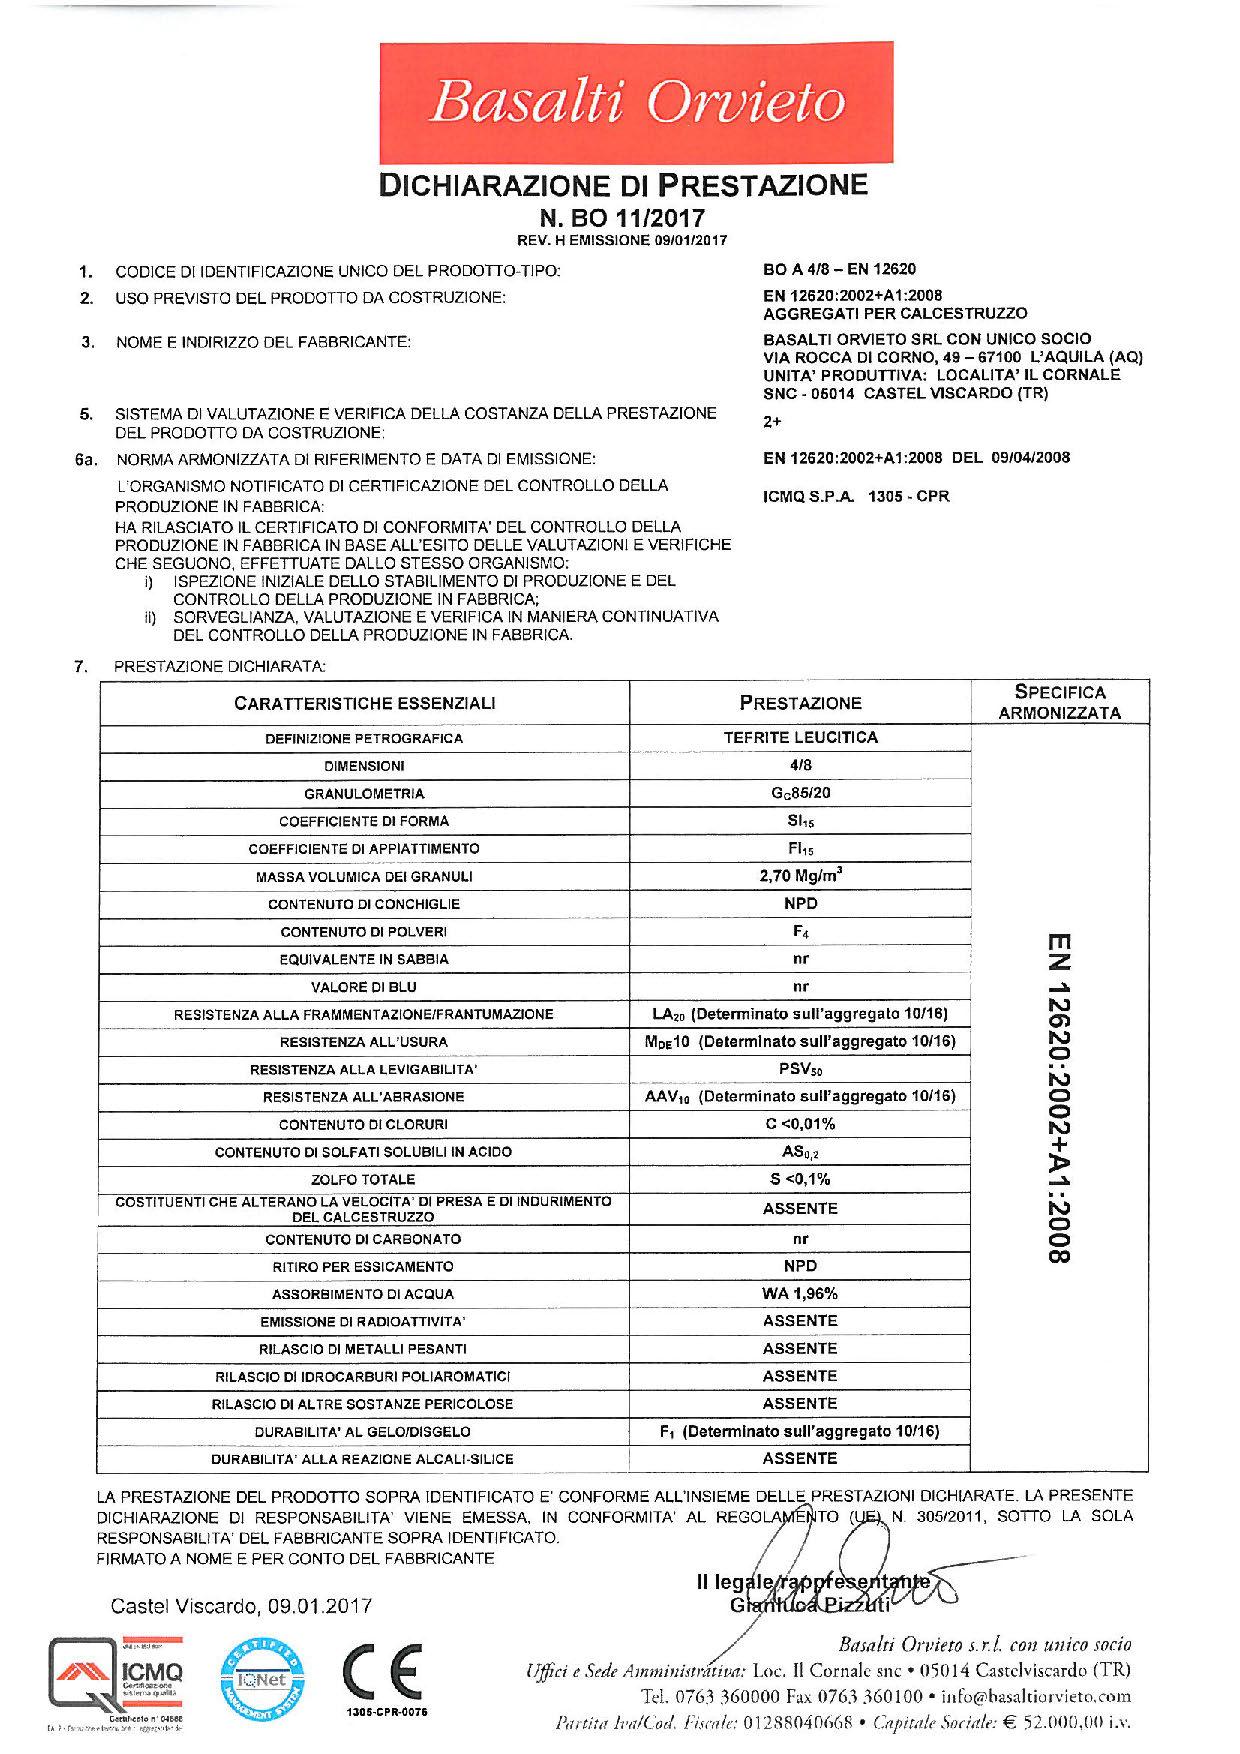 Calcestruzzo_DoP 4-8 - EN 12620